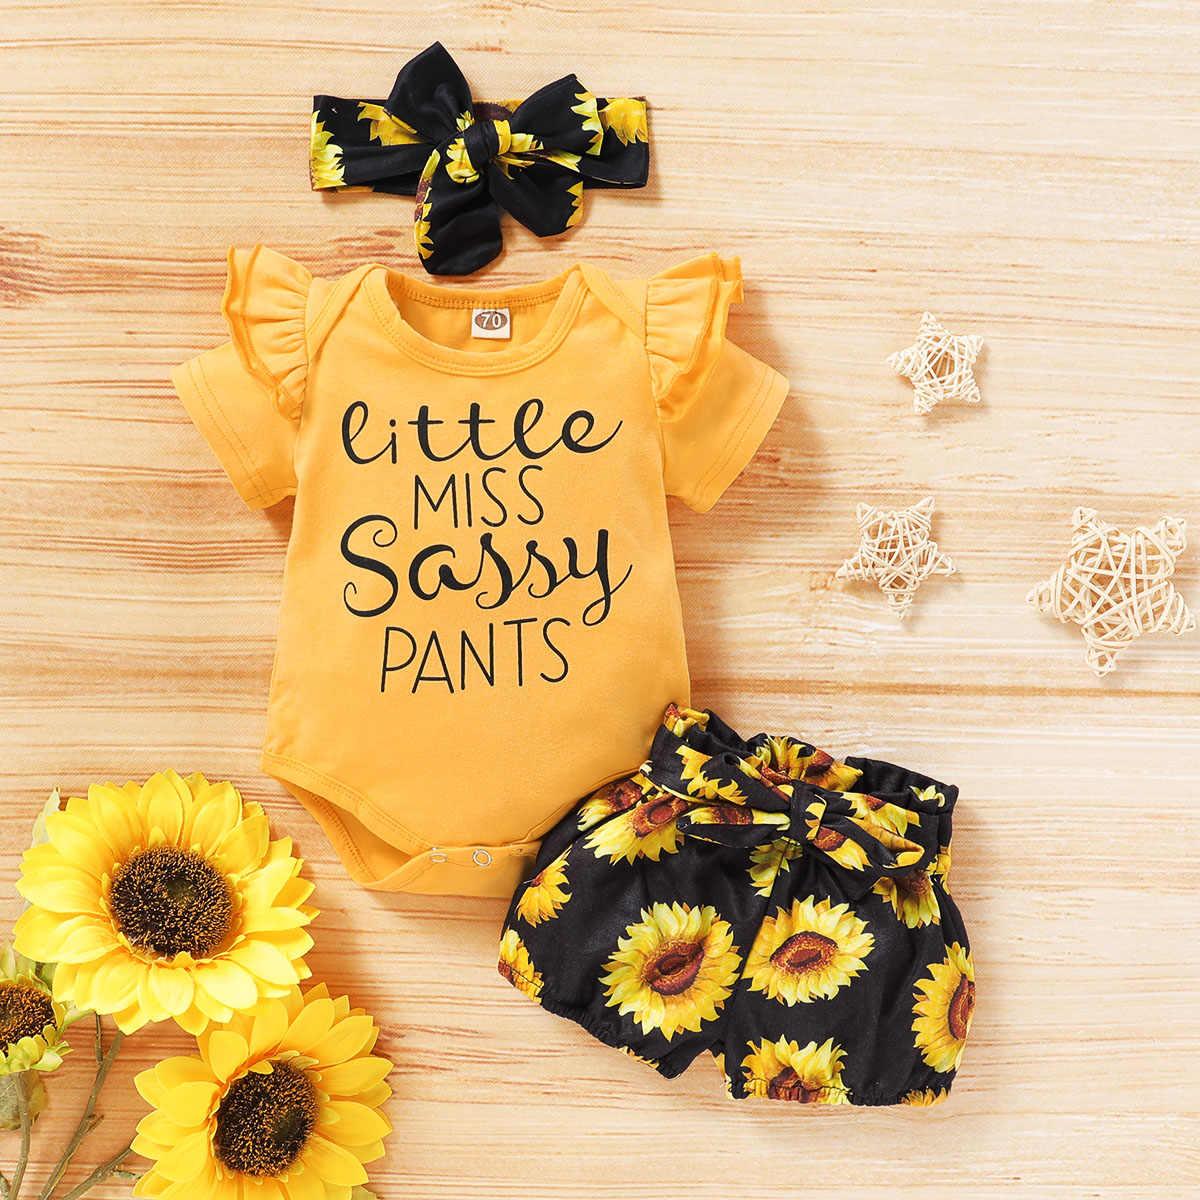 Toddler Baby Infant Girls 3Pcs Sunflower Outfits Headband Ruffle Tops Shorts Set